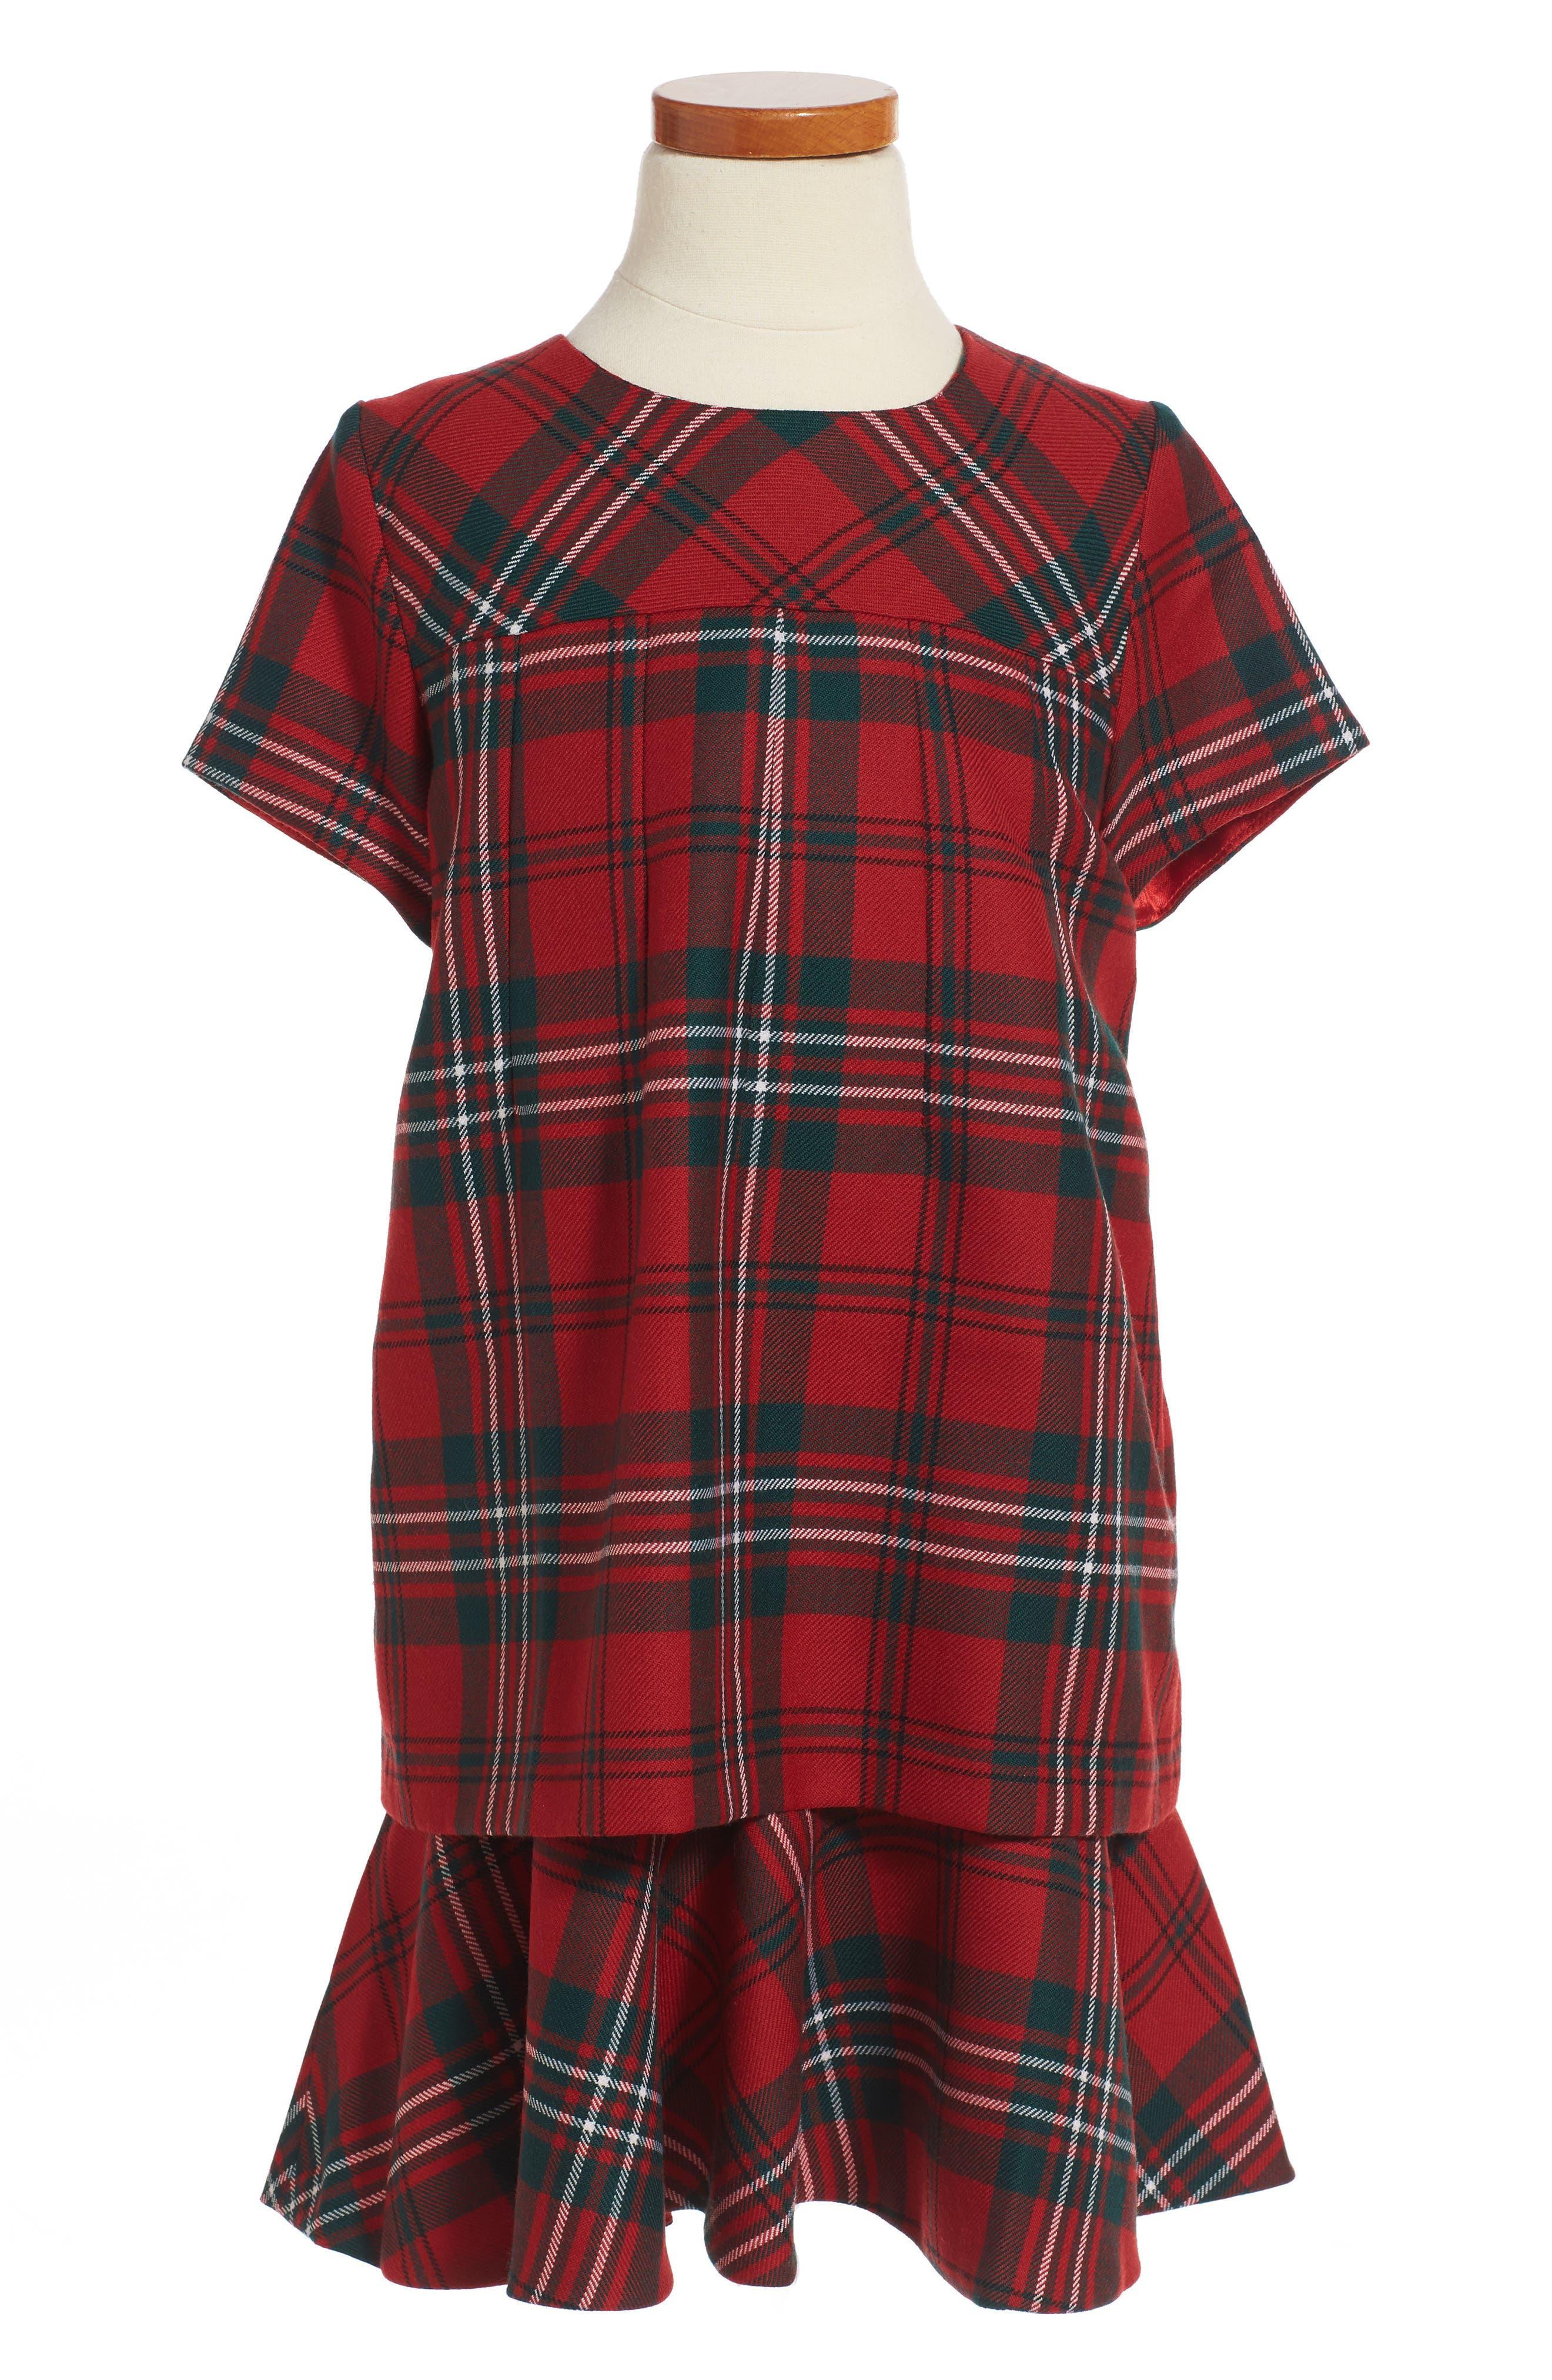 OSCAR DE LA RENTA Plaid Wool Dress